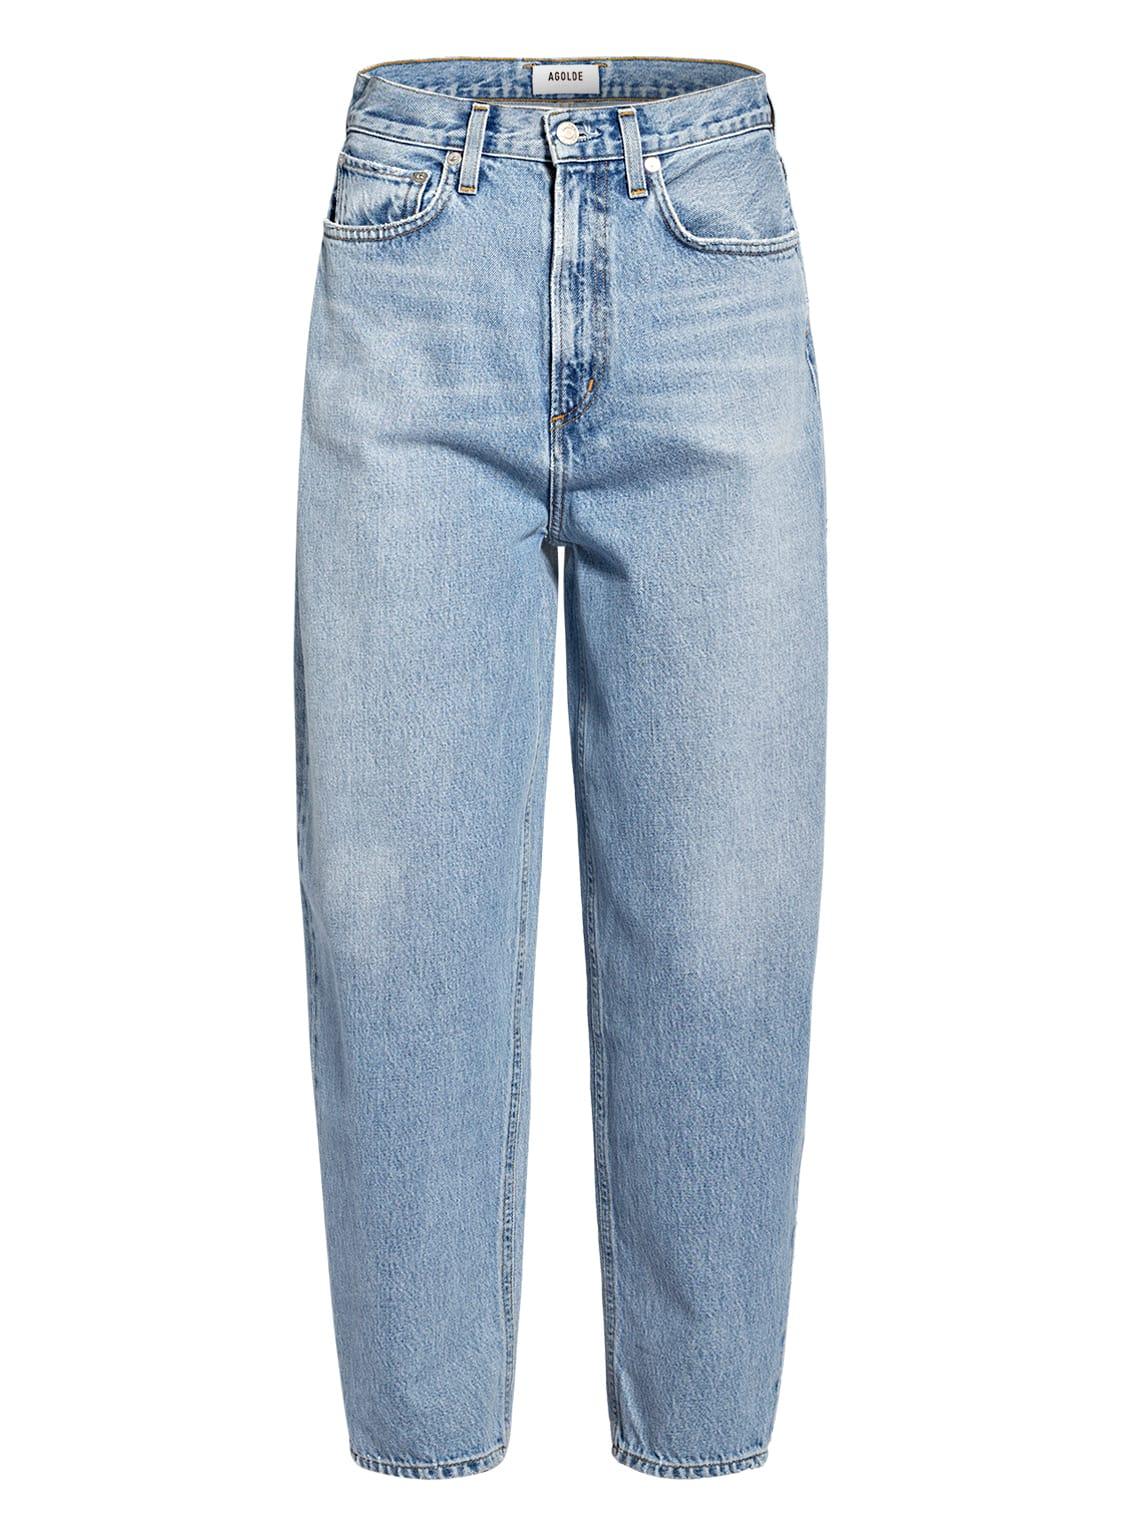 Image of Agolde Jeans 90s Pinch Waist blau